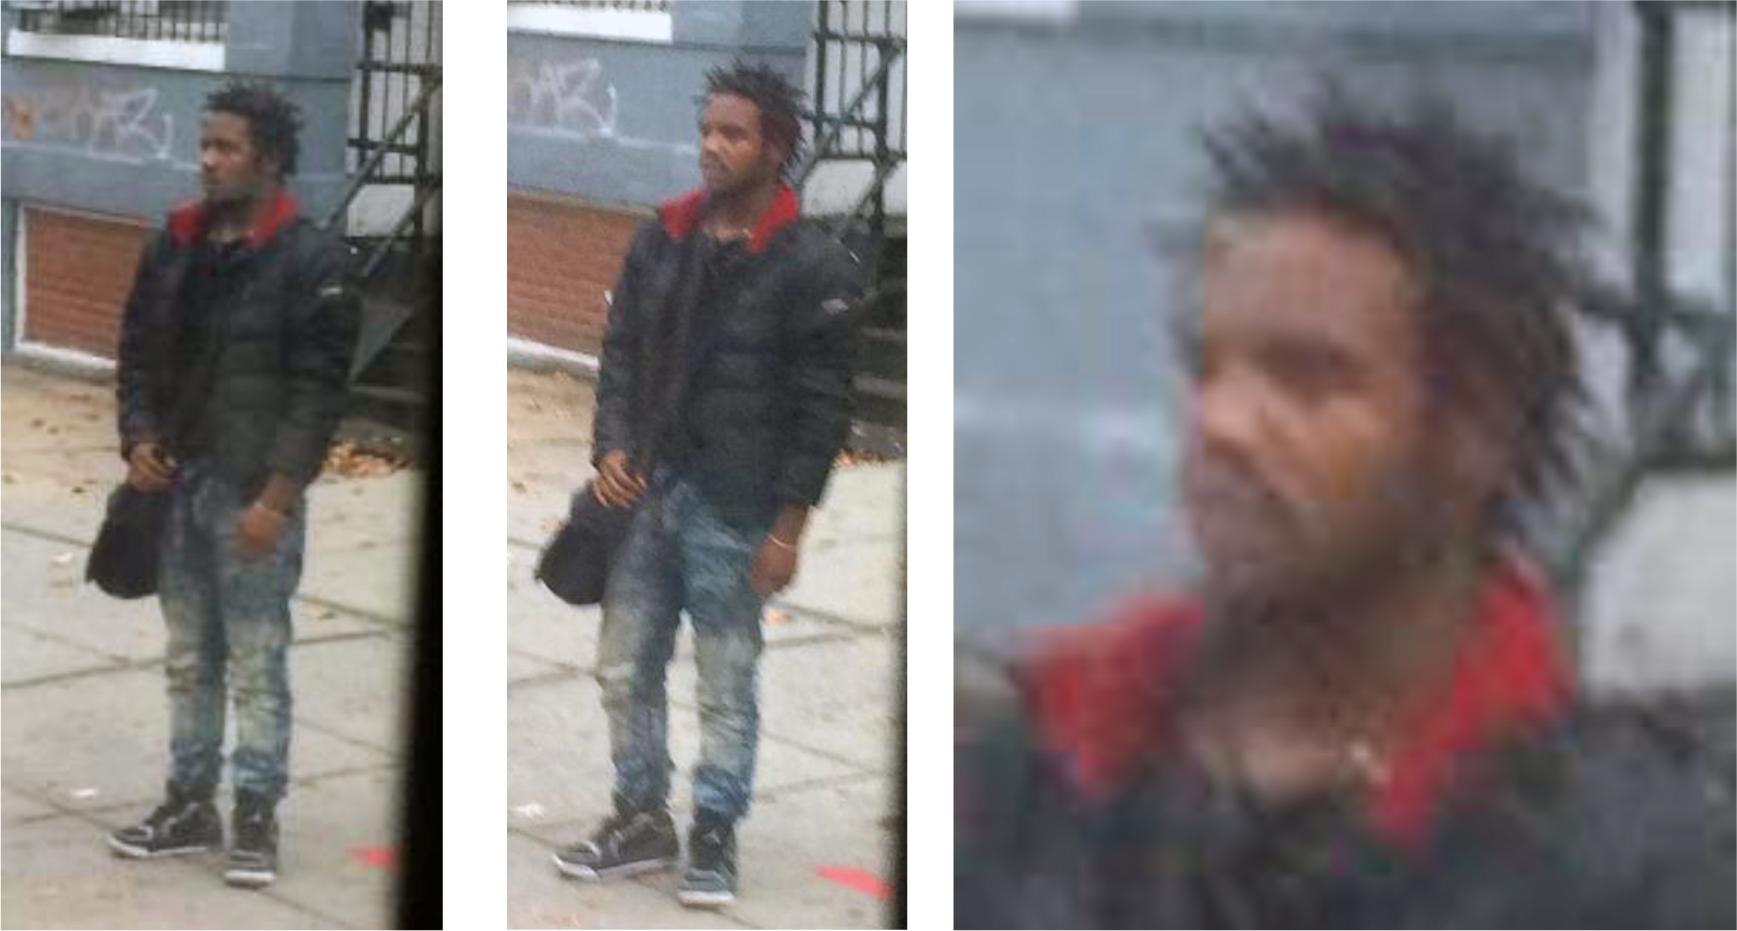 Man sought in Metrobus attack in Northwest